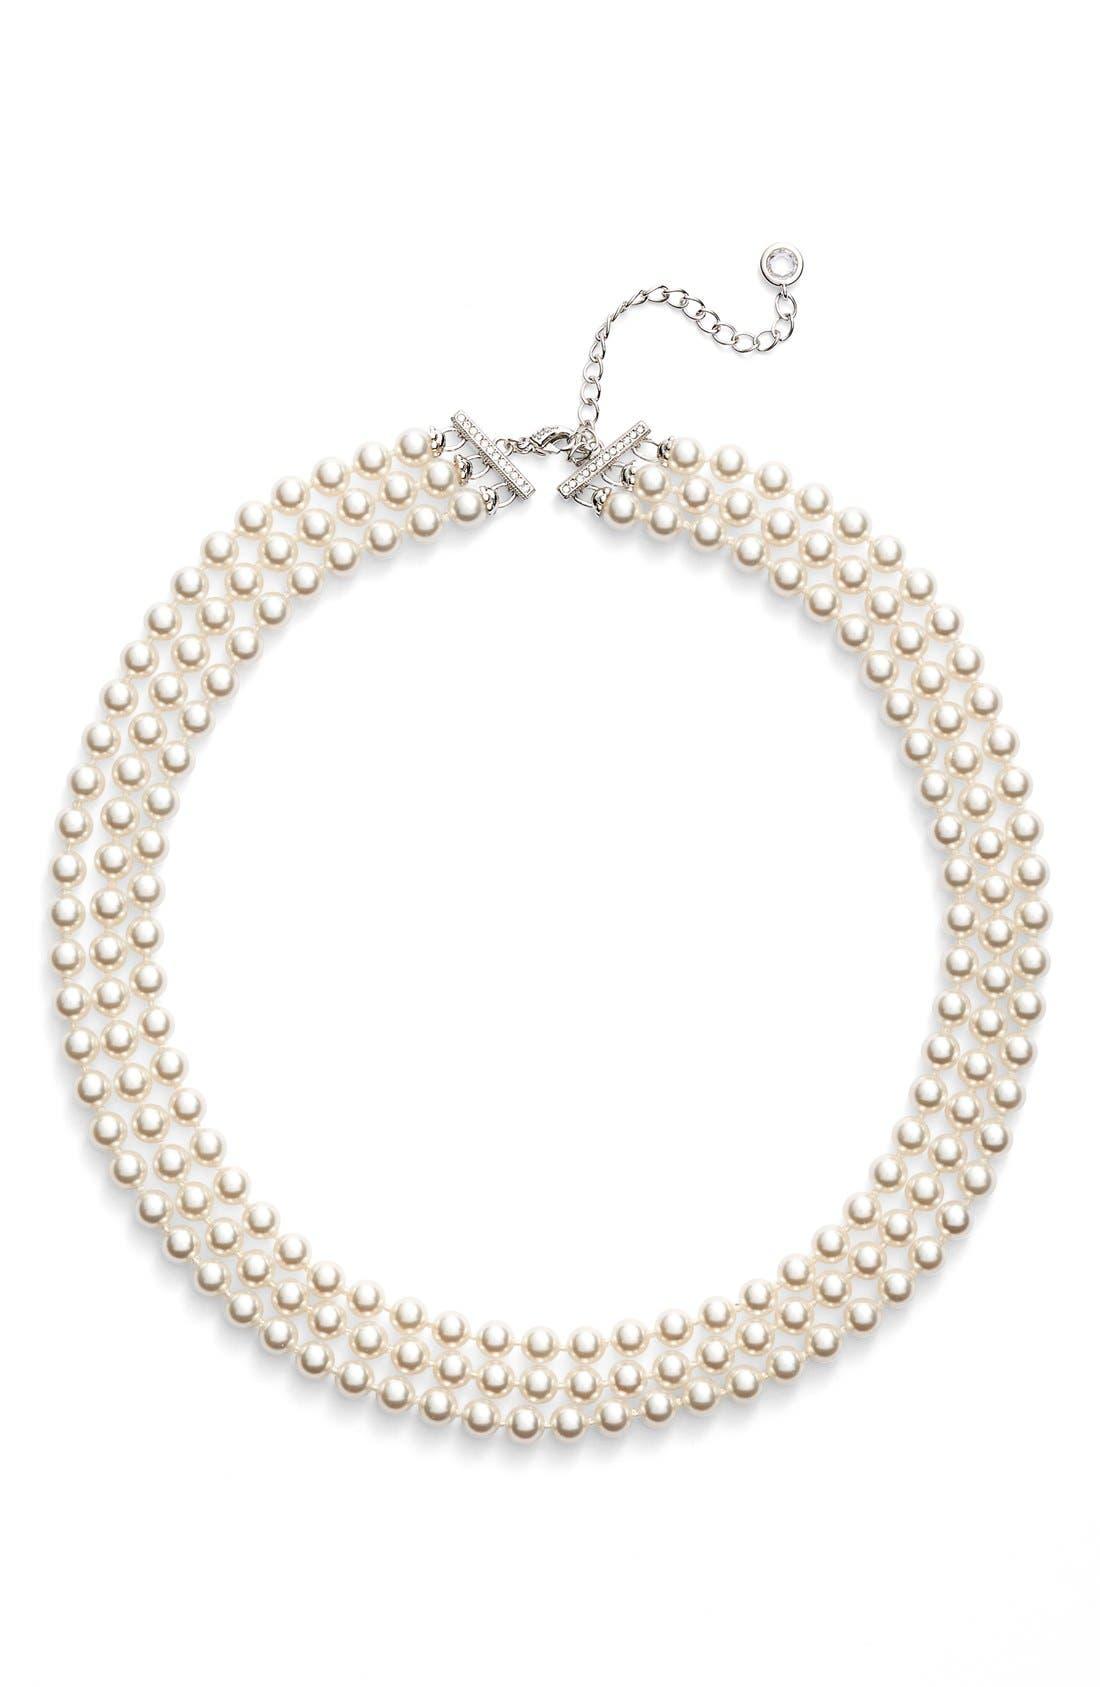 NADRI, Multistrand Imitation Pearl Necklace, Alternate thumbnail 2, color, IVORY